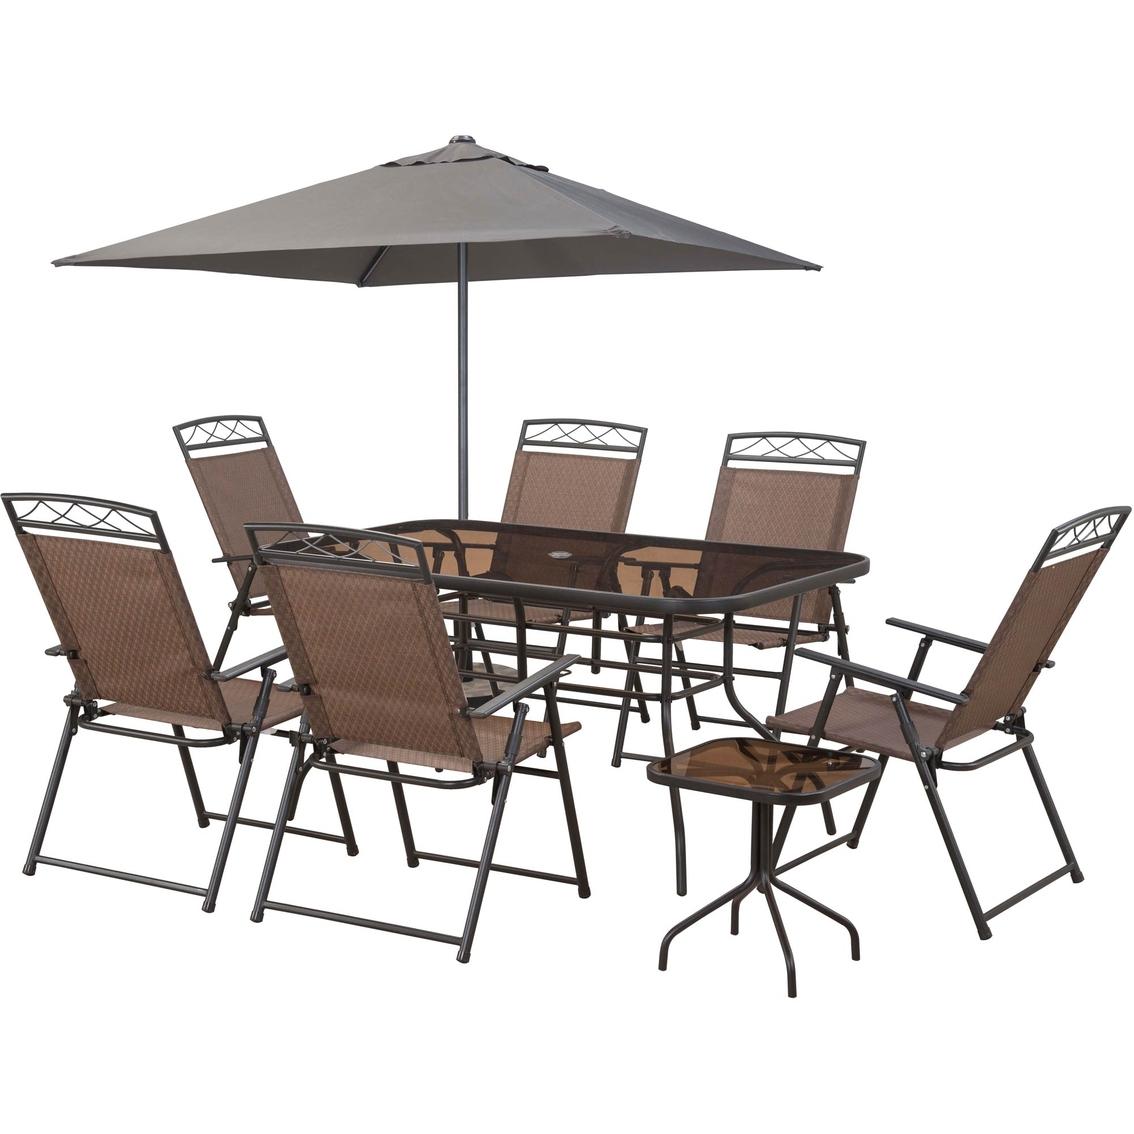 Courtyard Creations Arrowhead 9 Pc Sling Folding Set